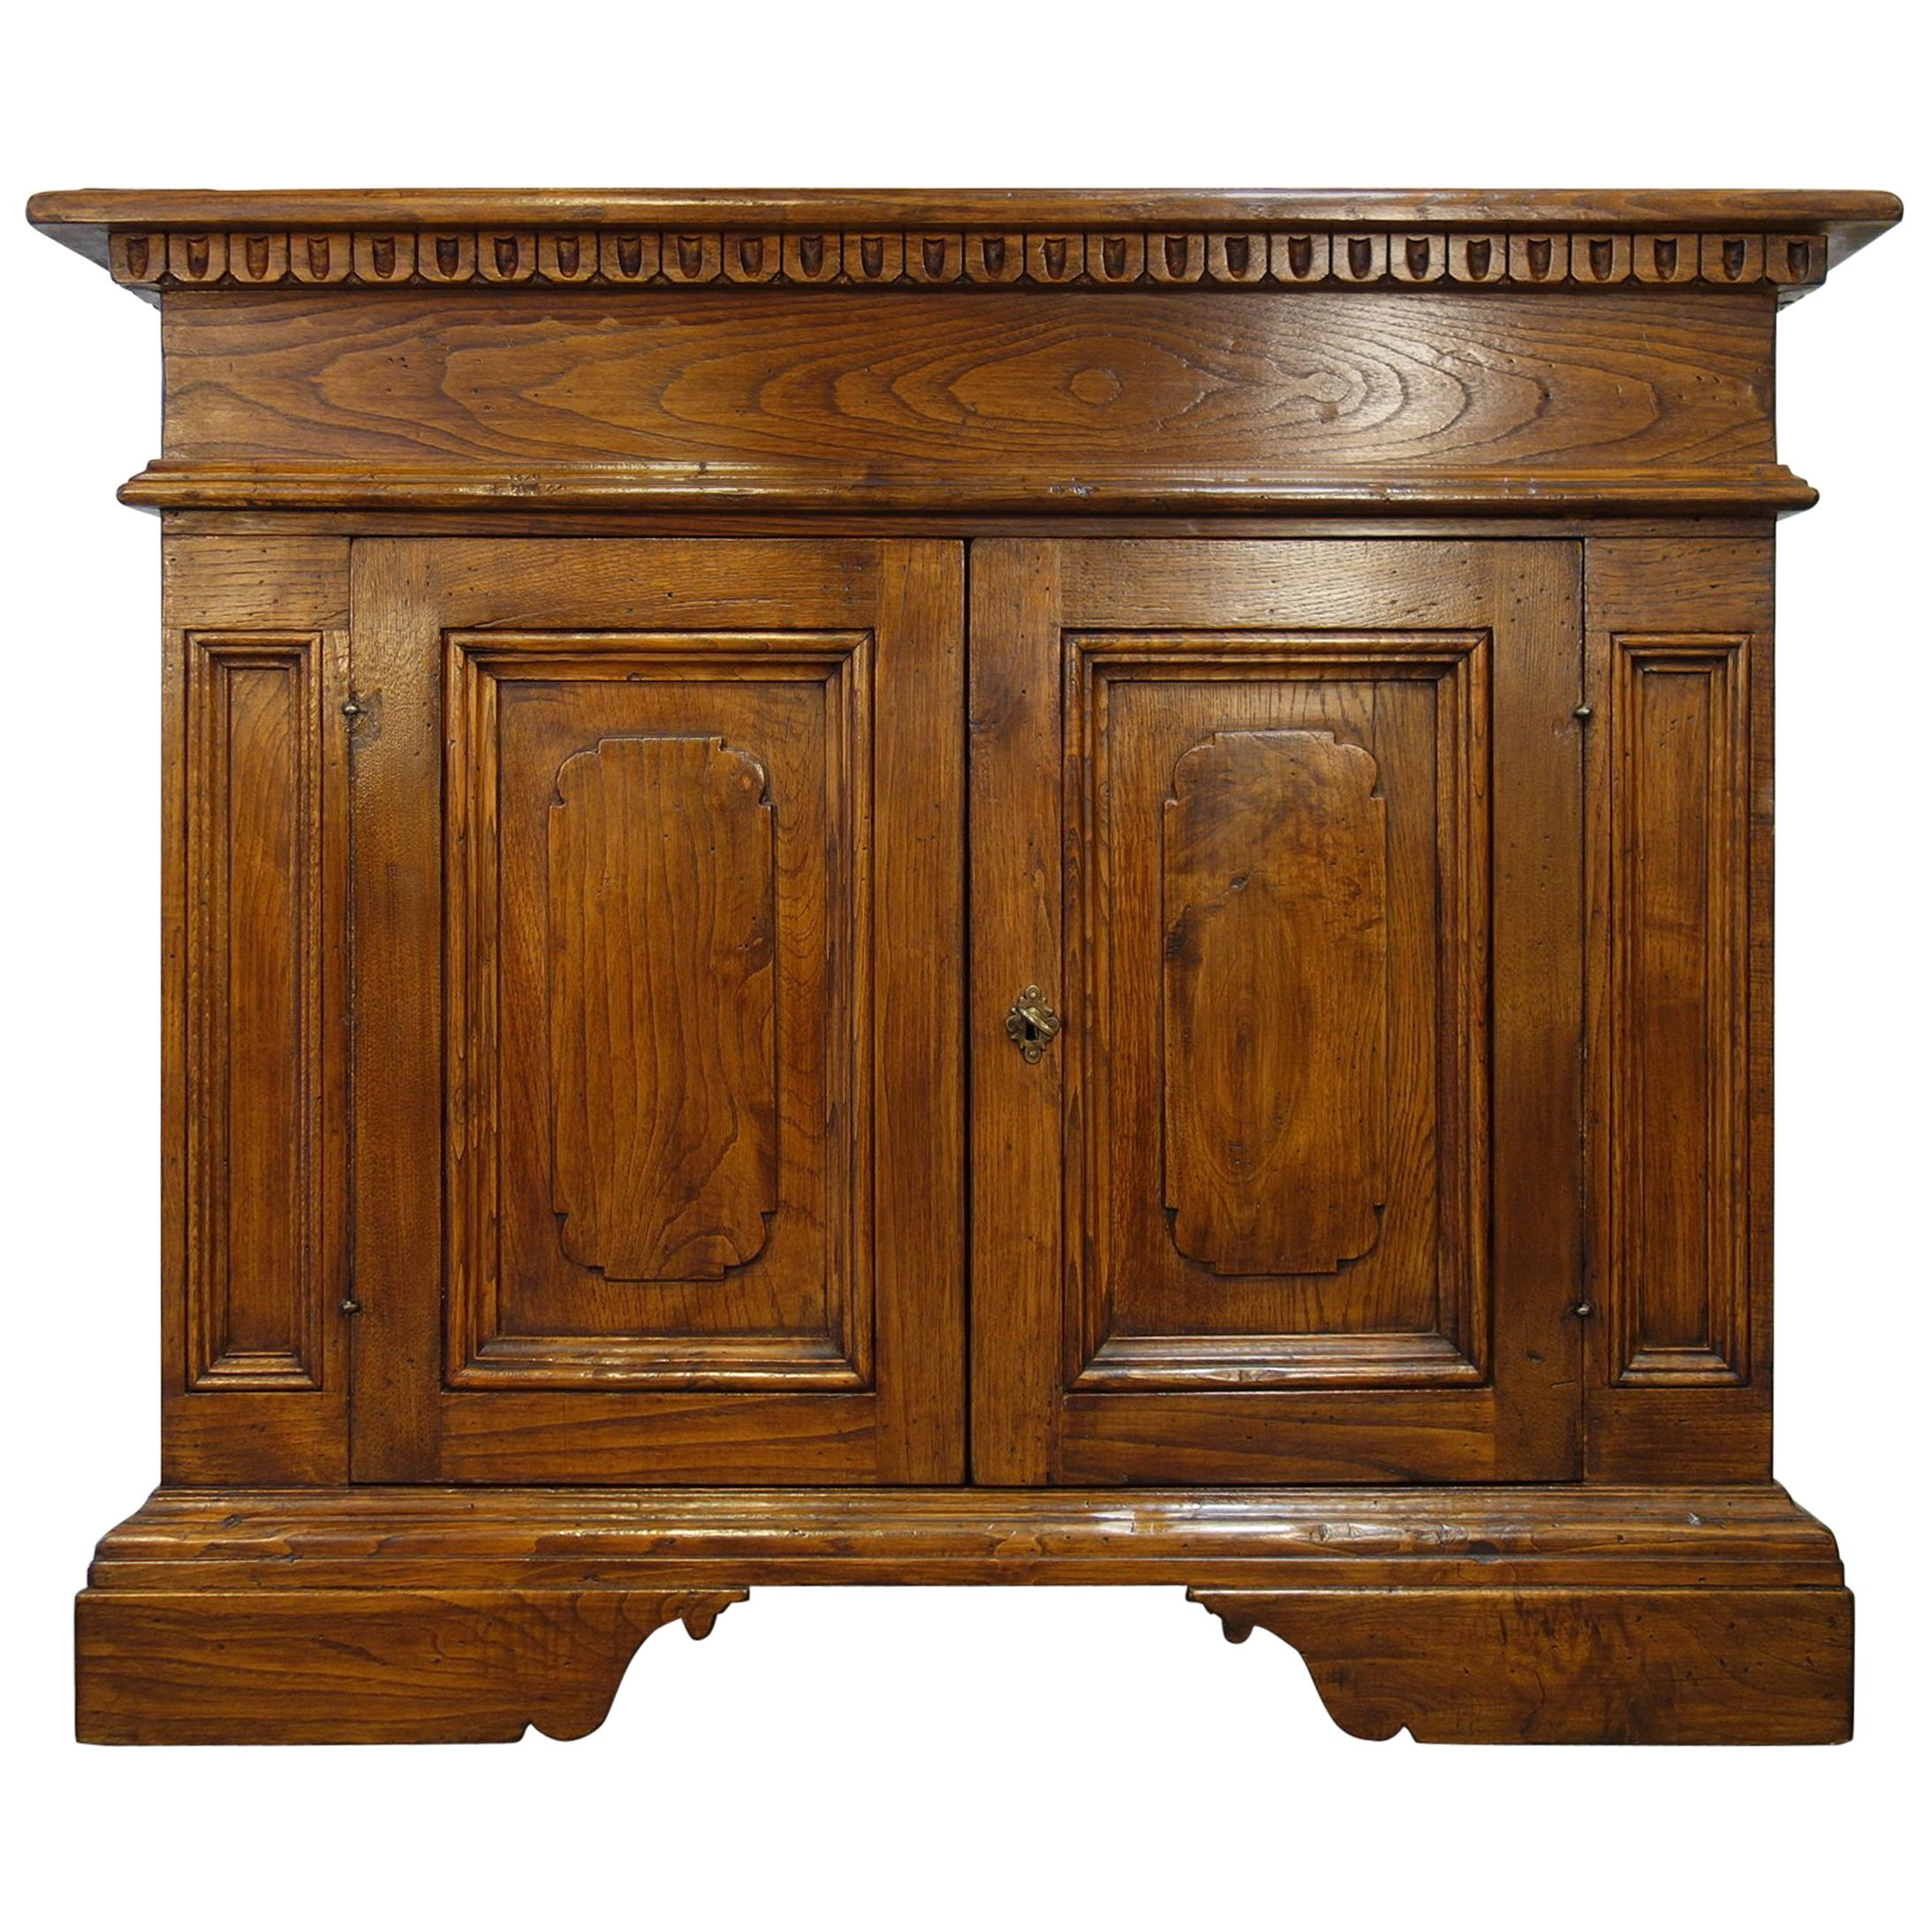 18th Century Style MAGGIORE Old Chestnut Credenza, Custom Cabinet & Vanity Line